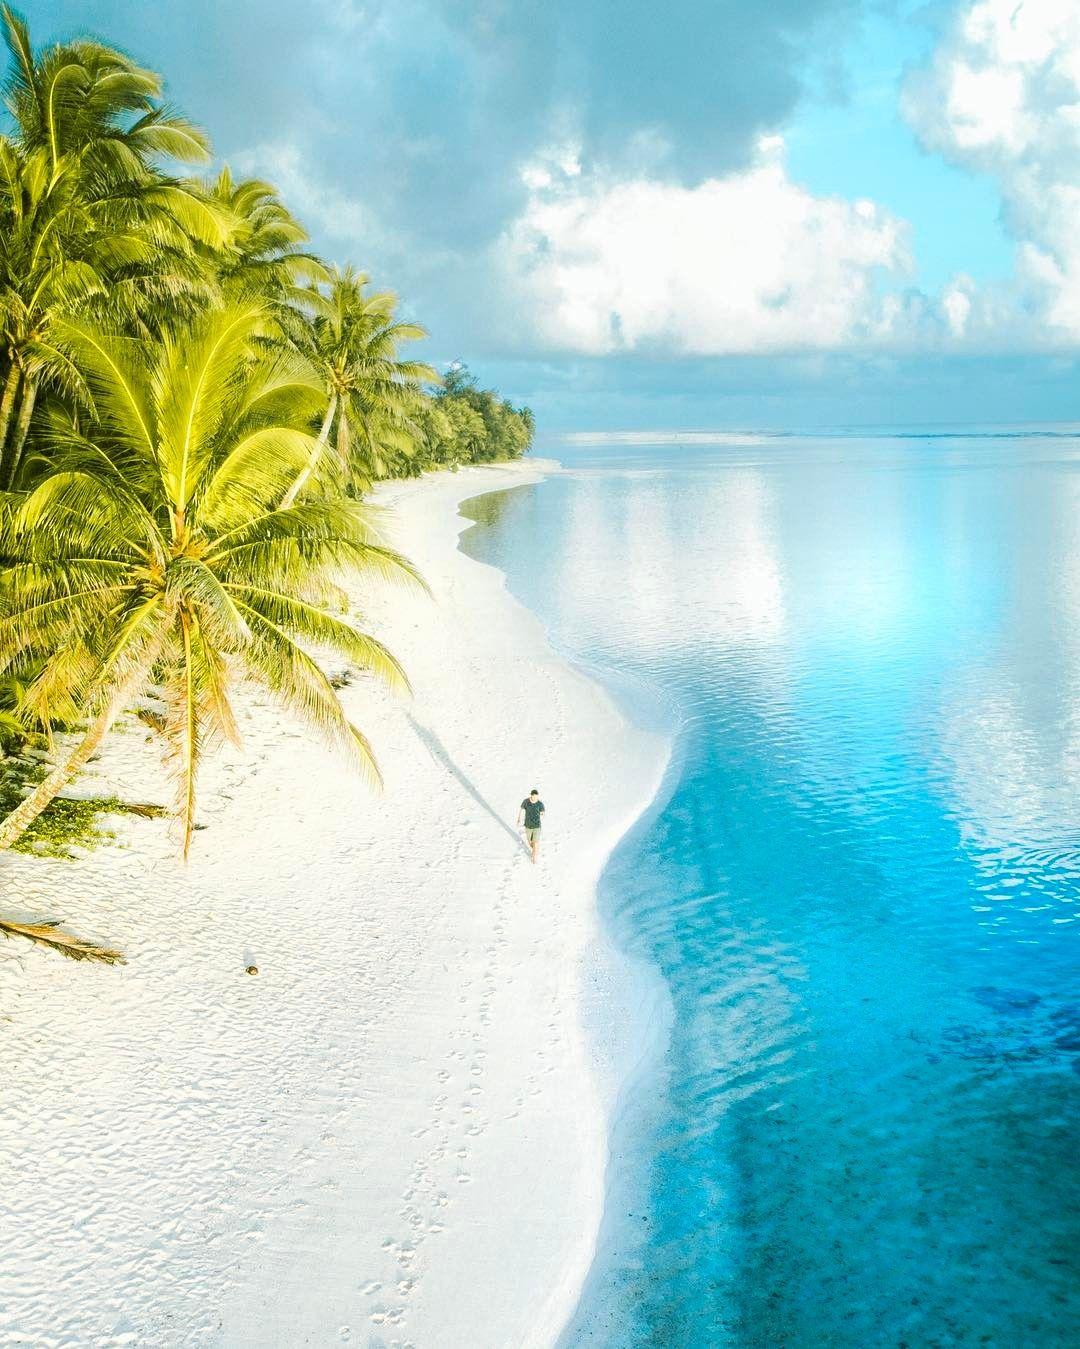 Solomon Islands Beach: Rarotonga, Cook Islands, Ph: Eric Rubens